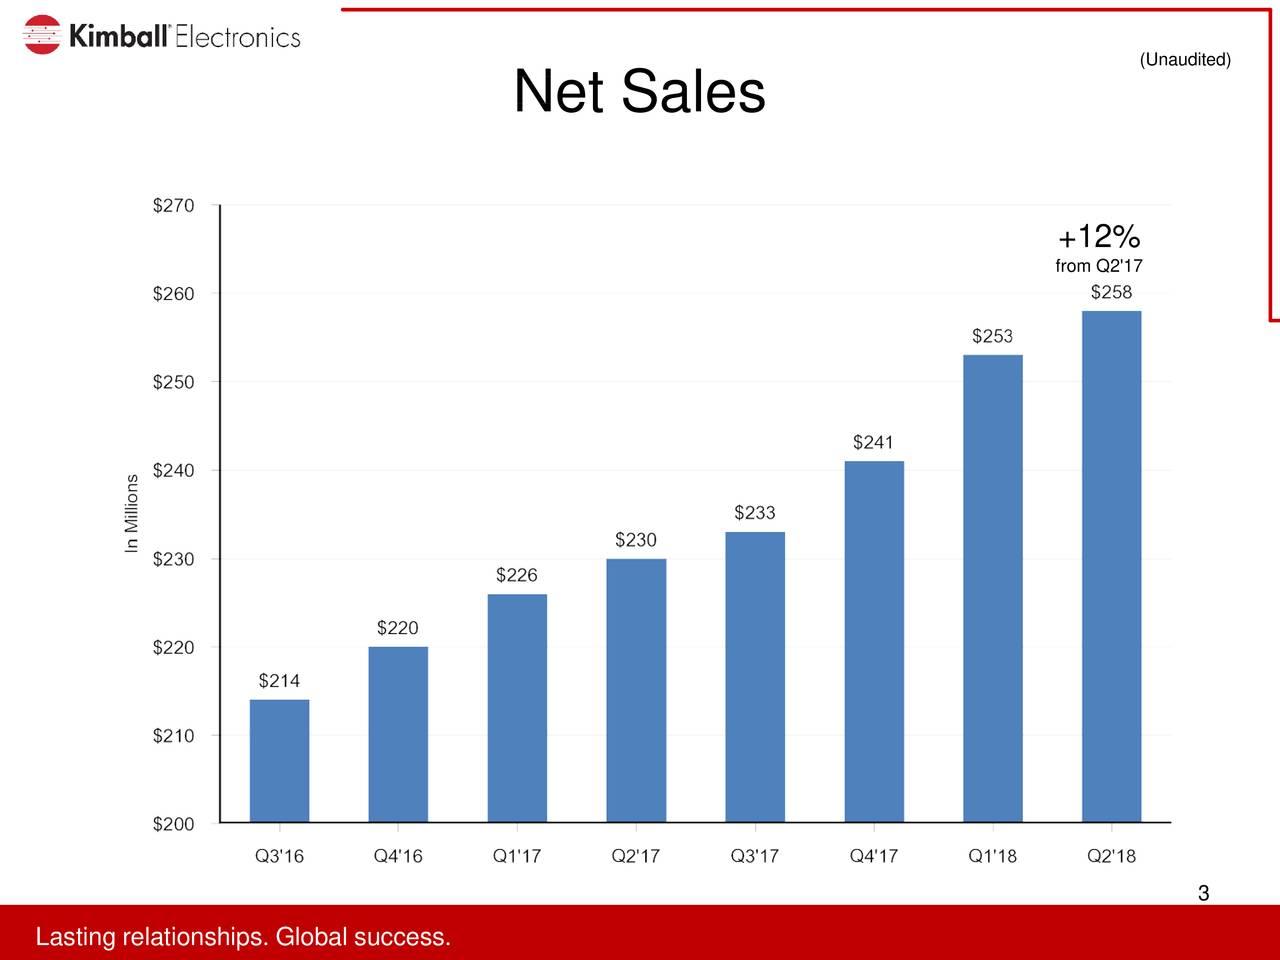 Net Sales from Q2'17 3 LaLaitinreralitonhspi.s.loloblalsuccsss.s.